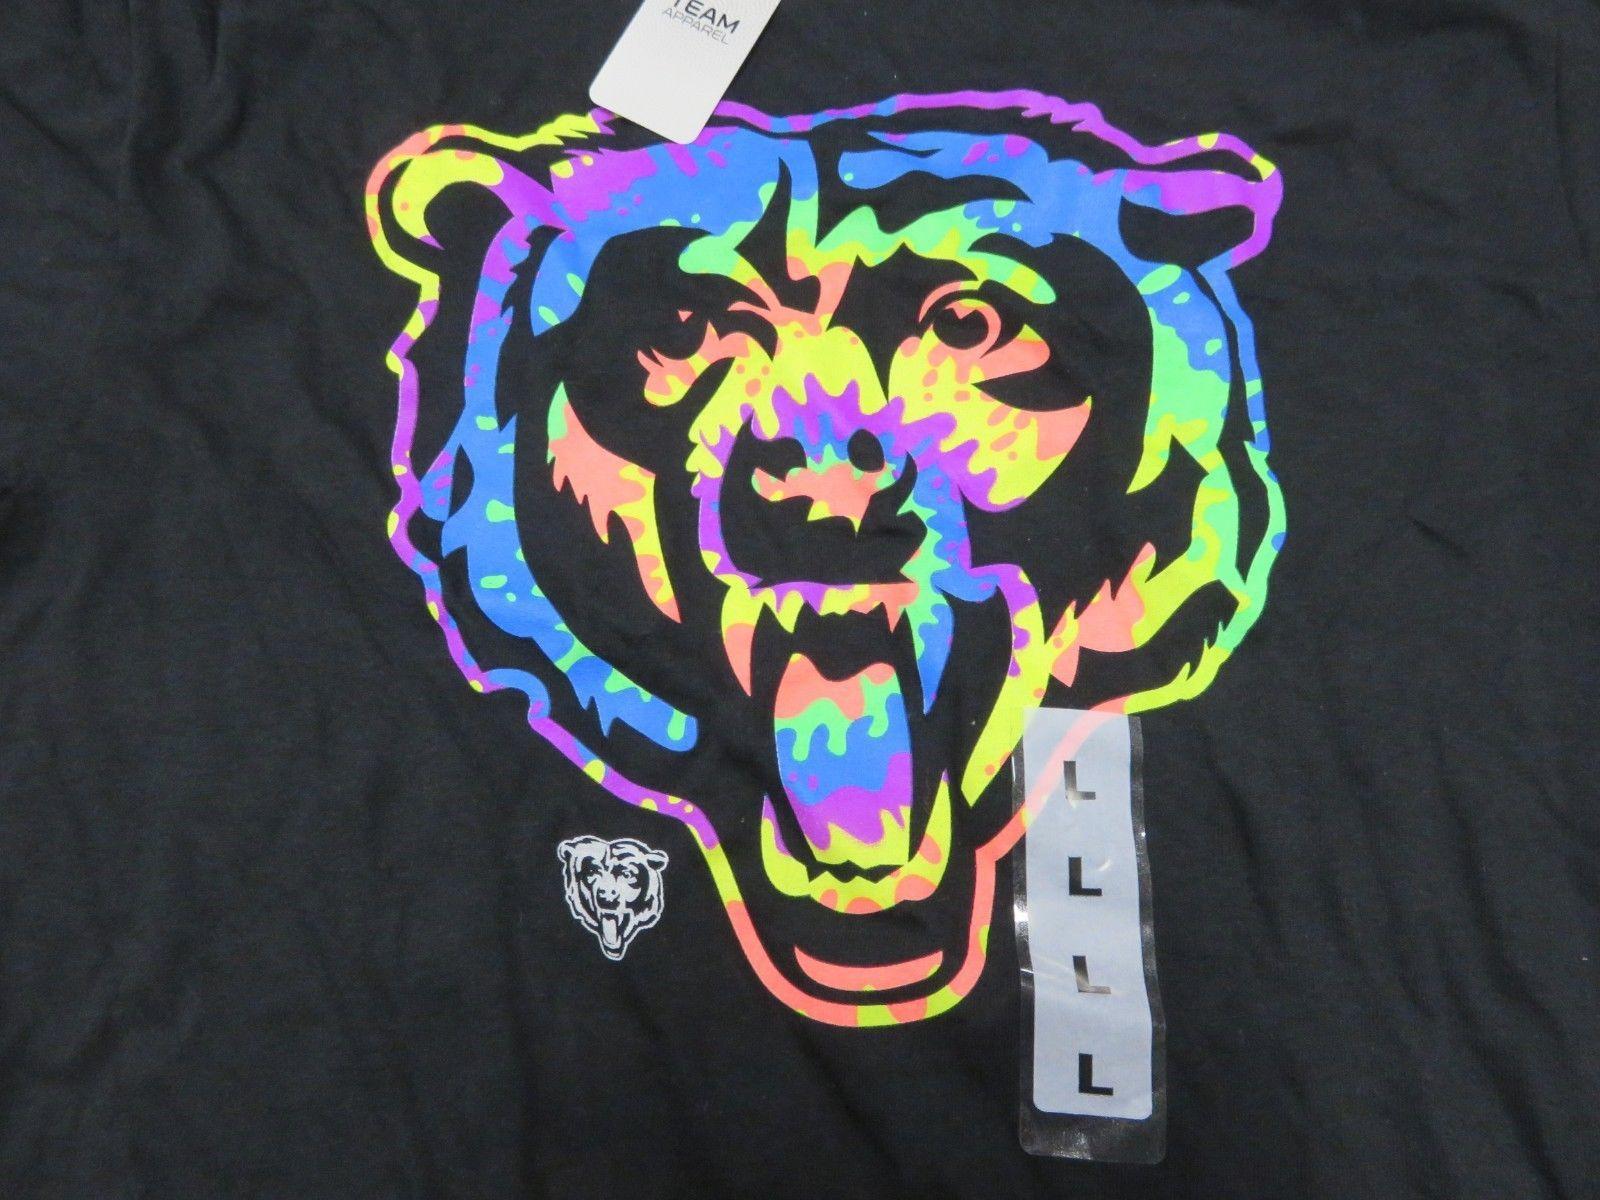 NWT NFL Team Apparel Chicago Bears Black w/ Rainbow Graphic T-Shirt Men's Size L image 2